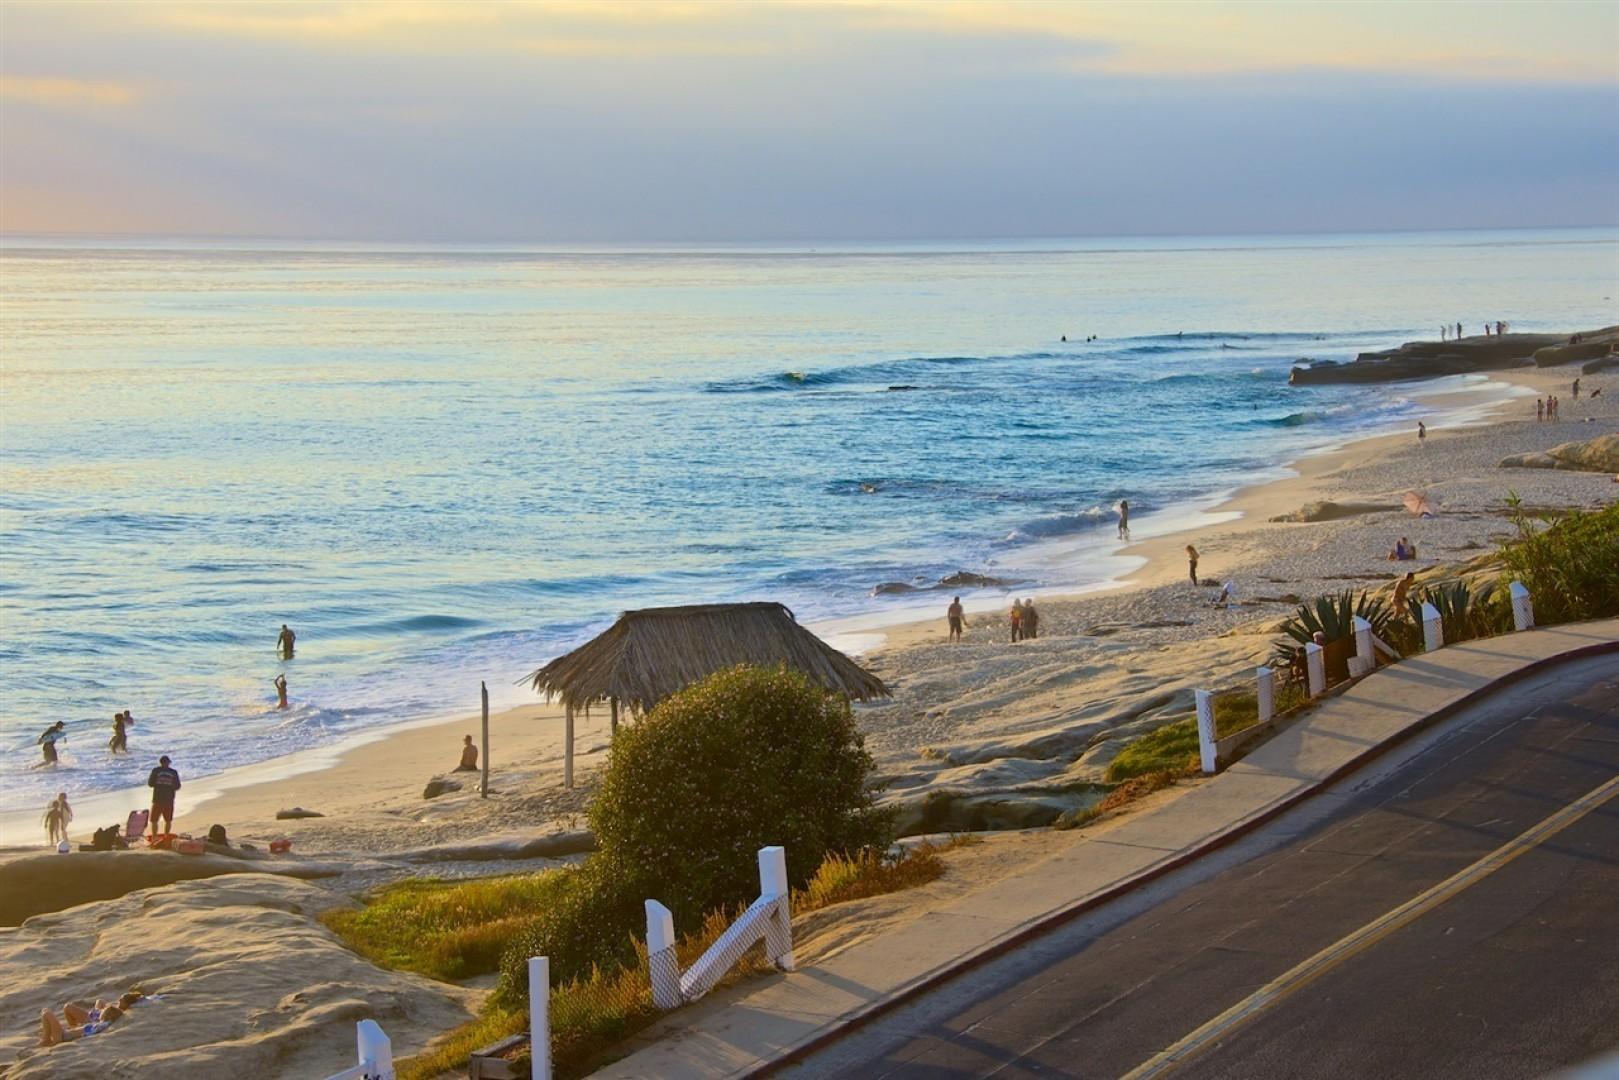 The famous Windansea Surf Shack